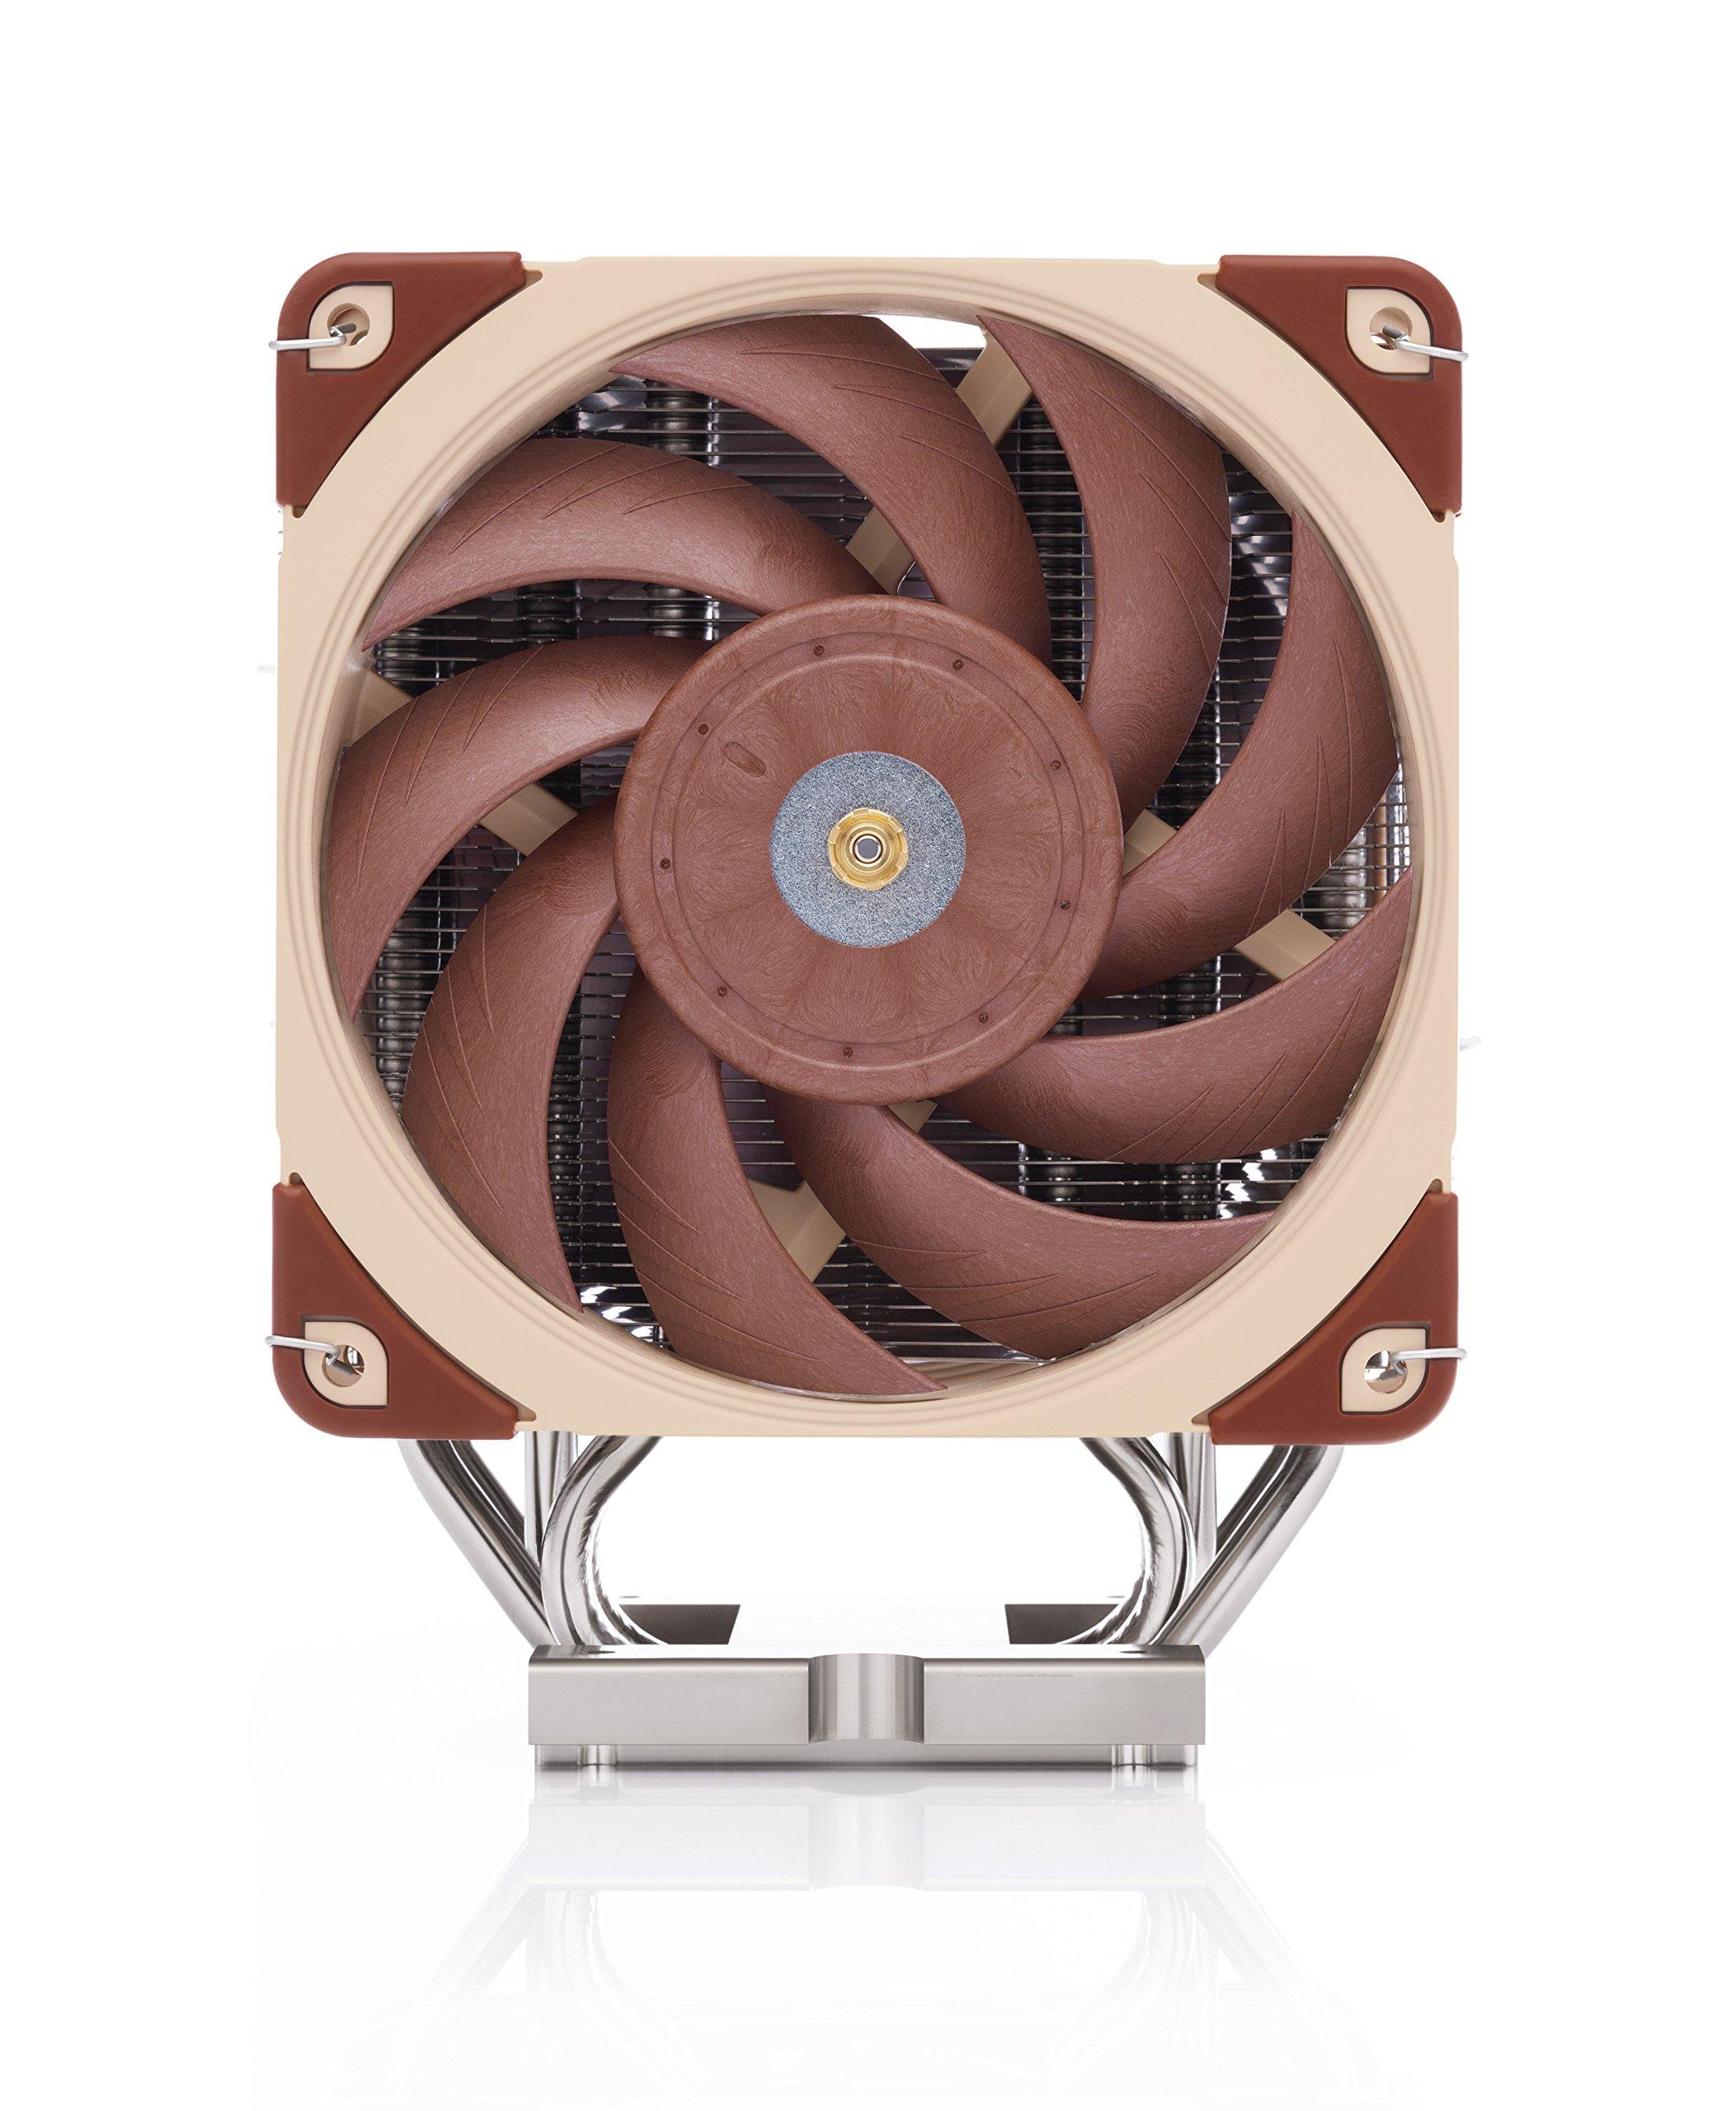 Noctua NH-U12S DX-3647 Premium Quality Quiet 120mm CPU Cooler for Intel Xeon LGA3647 by Noctua (Image #2)